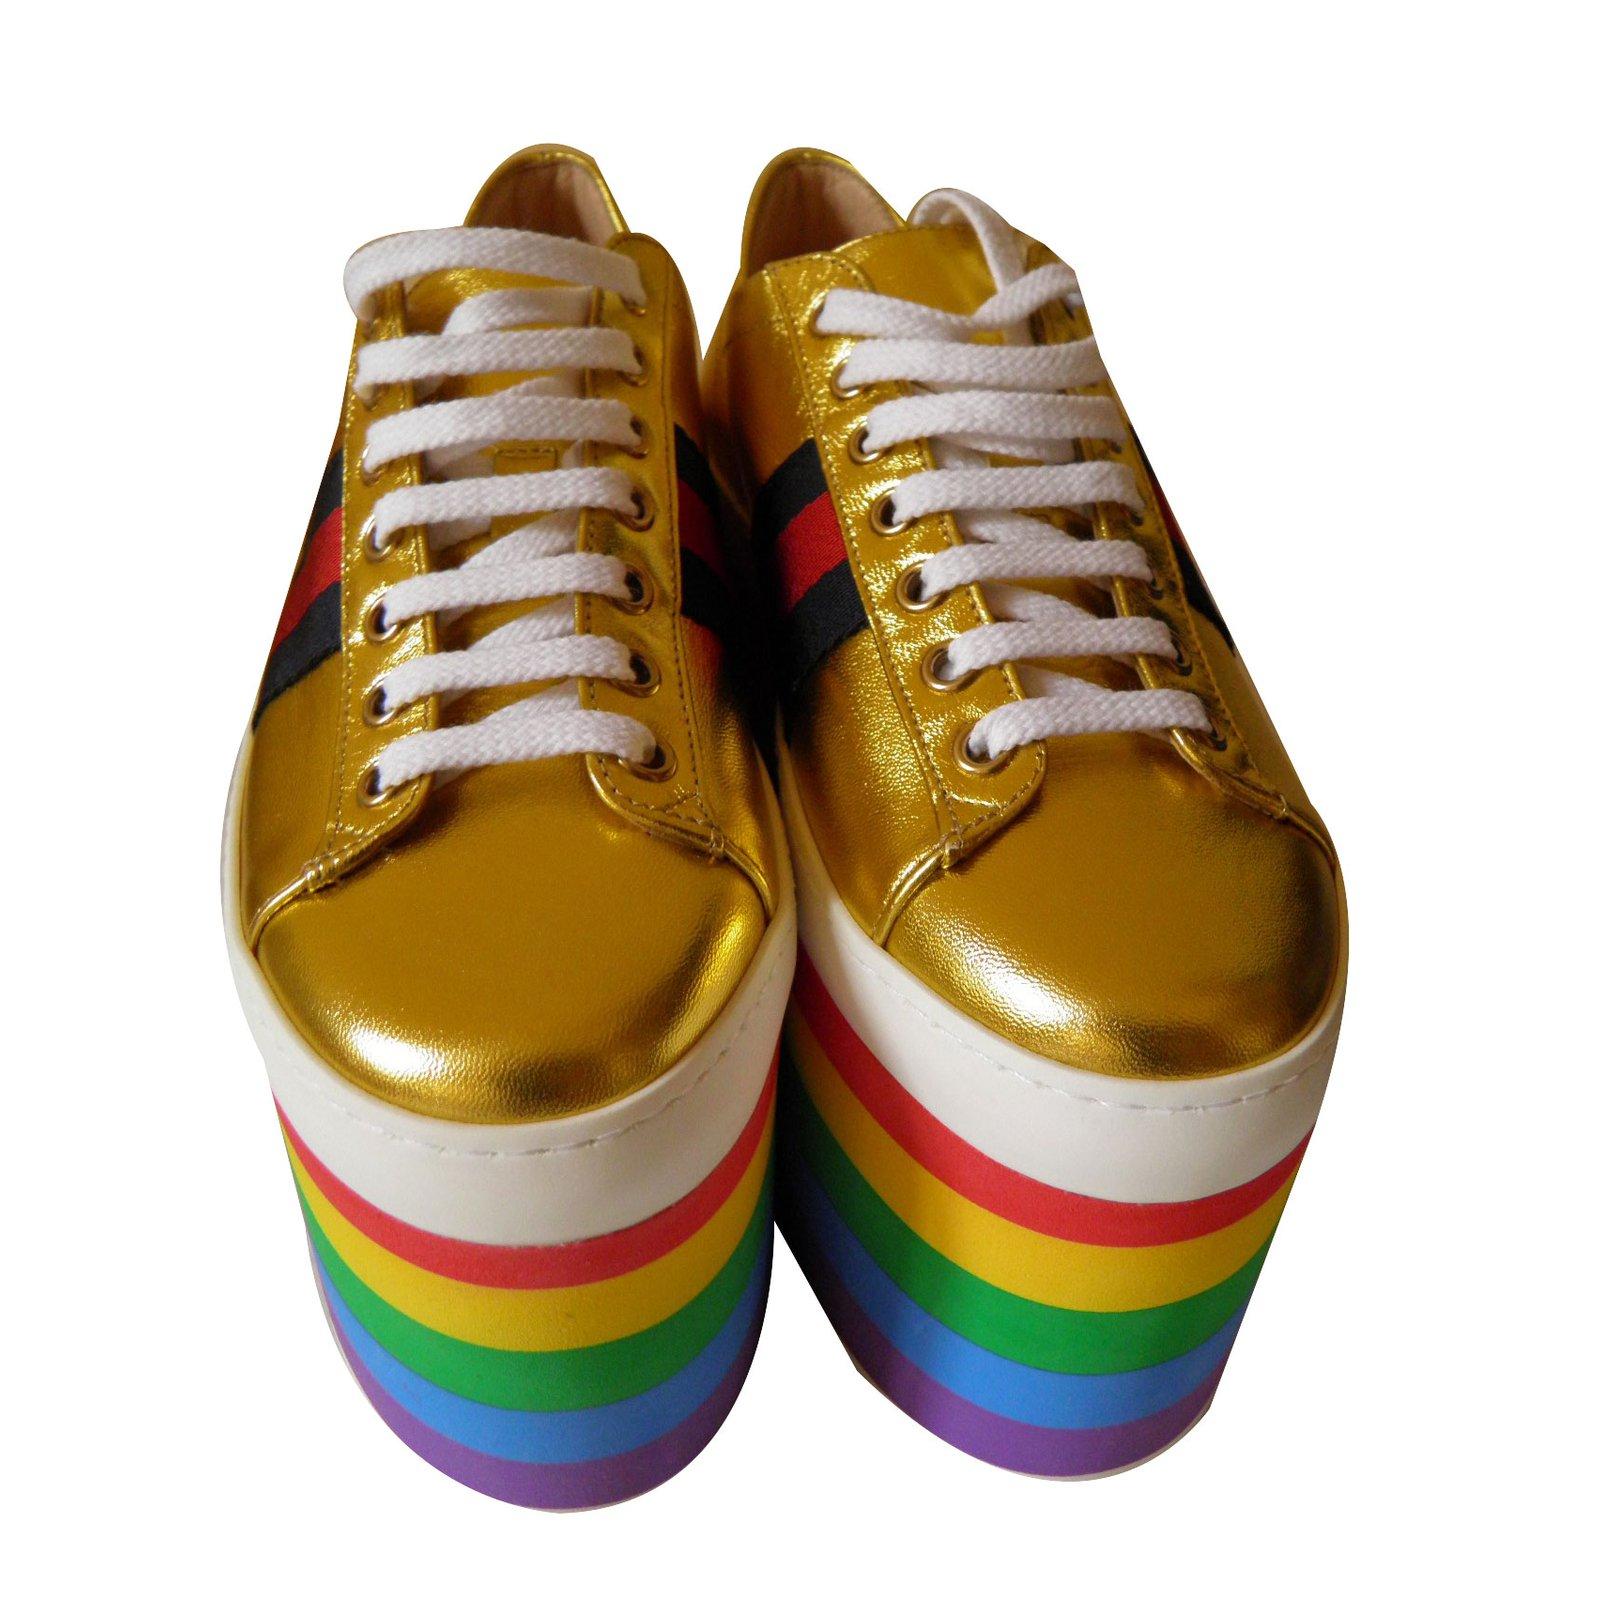 0cf48aed868 Gucci rainbow platform sneakers Sneakers Leather Golden ref.69192 - Joli  Closet